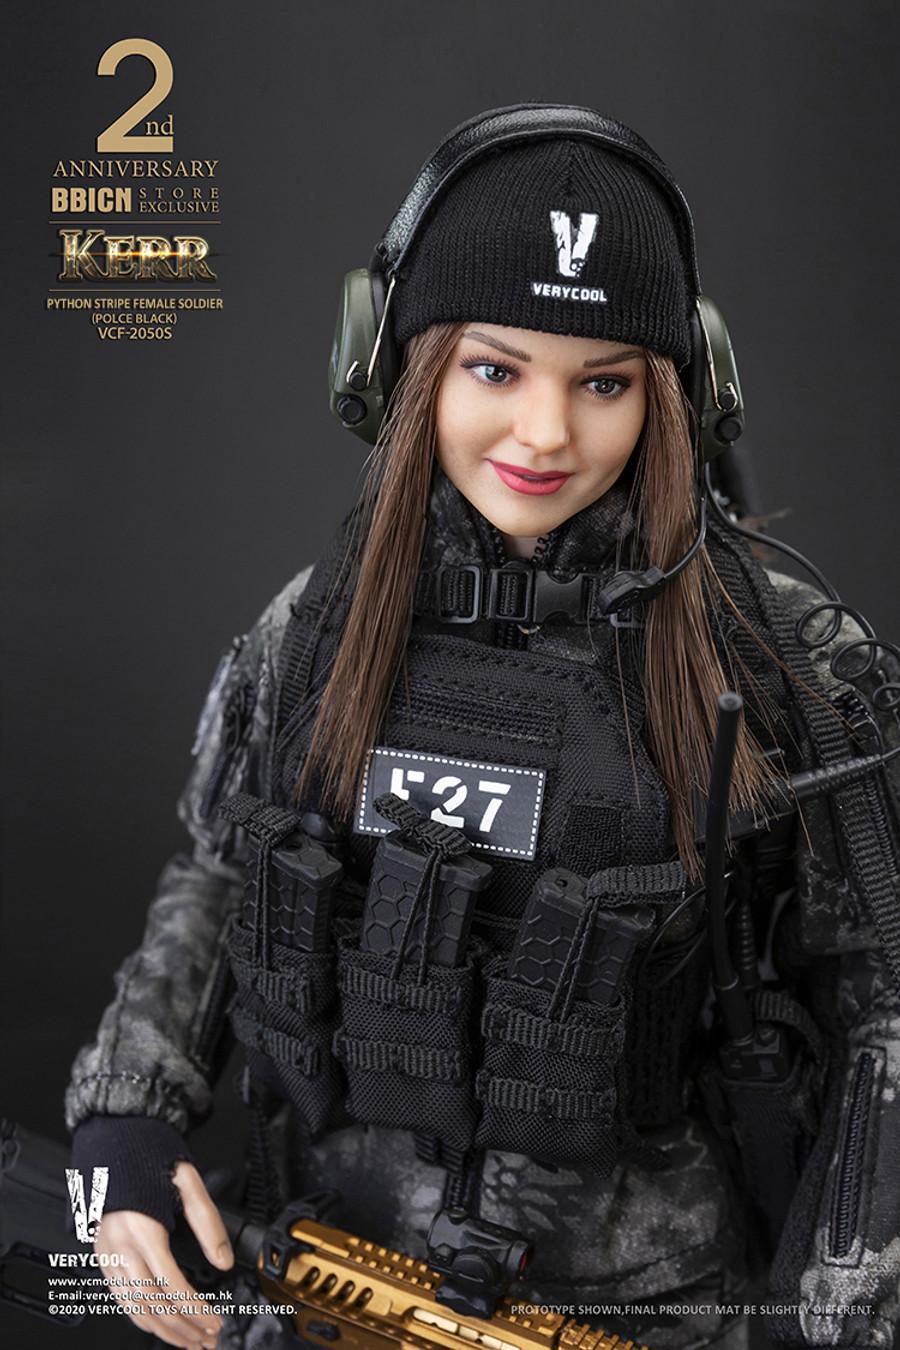 Very Cool - Police Black Python Stripe Female Soldier - Kerr